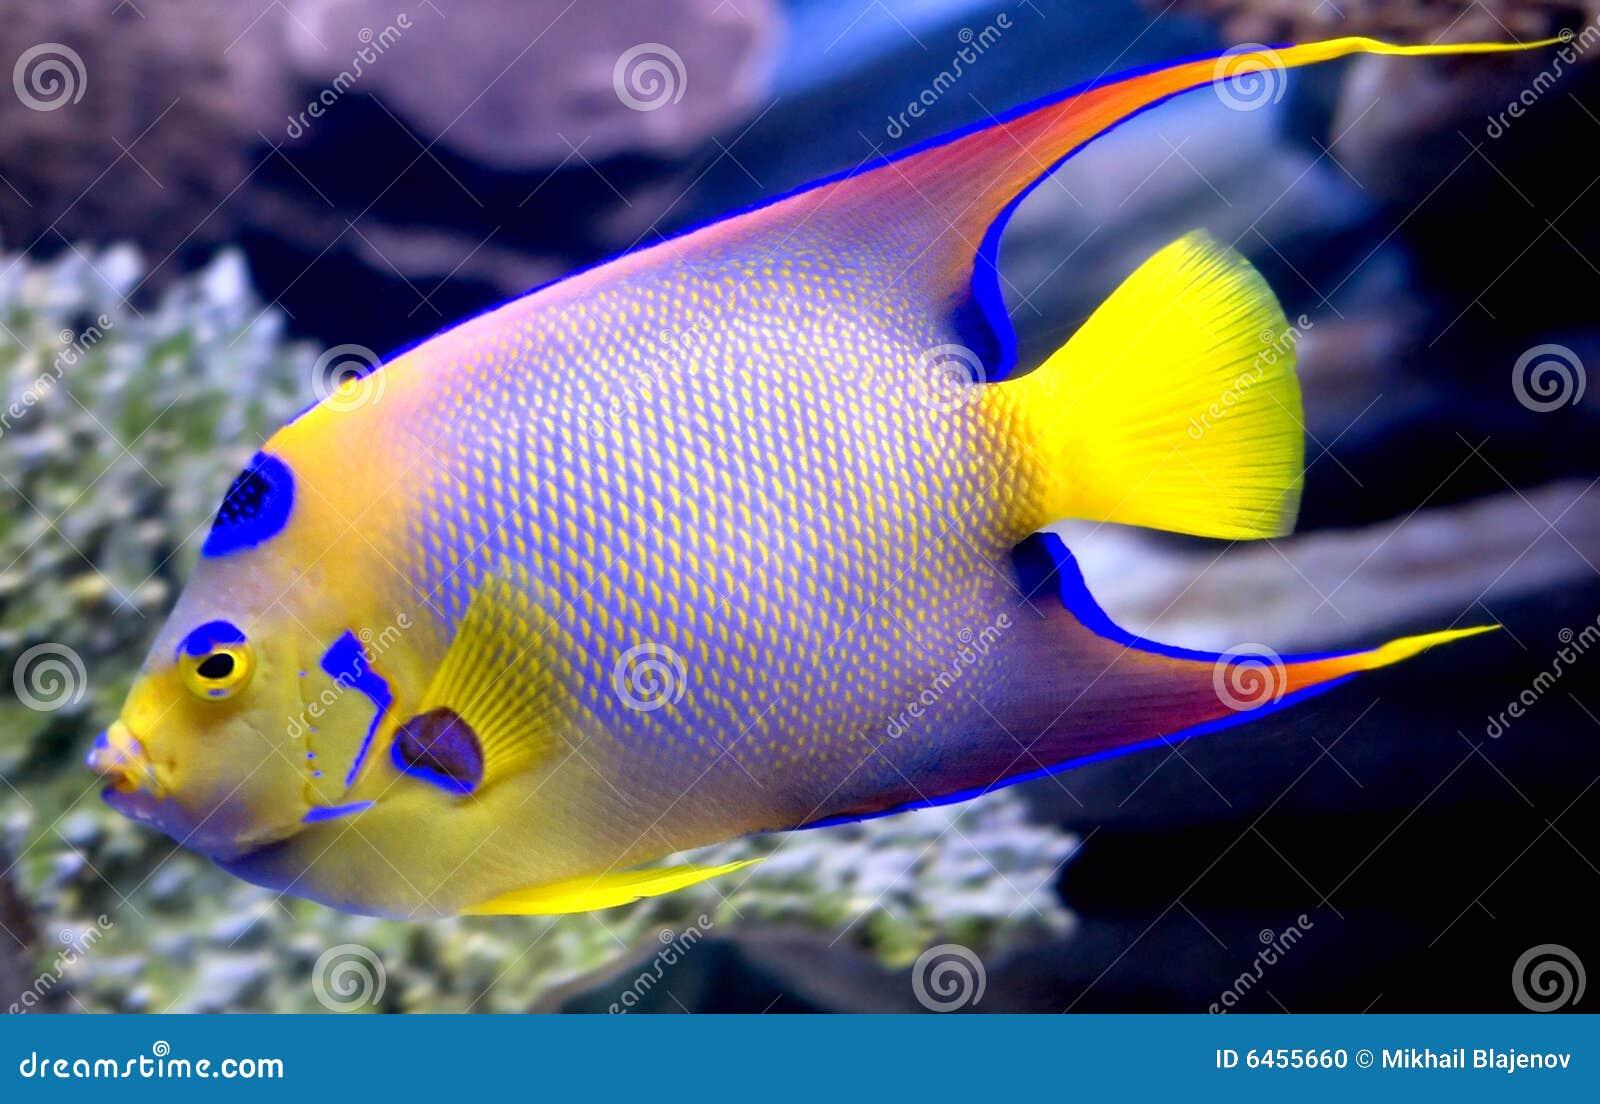 Queen angelfish 2 stock photo image of nature scales for Queen angel fish